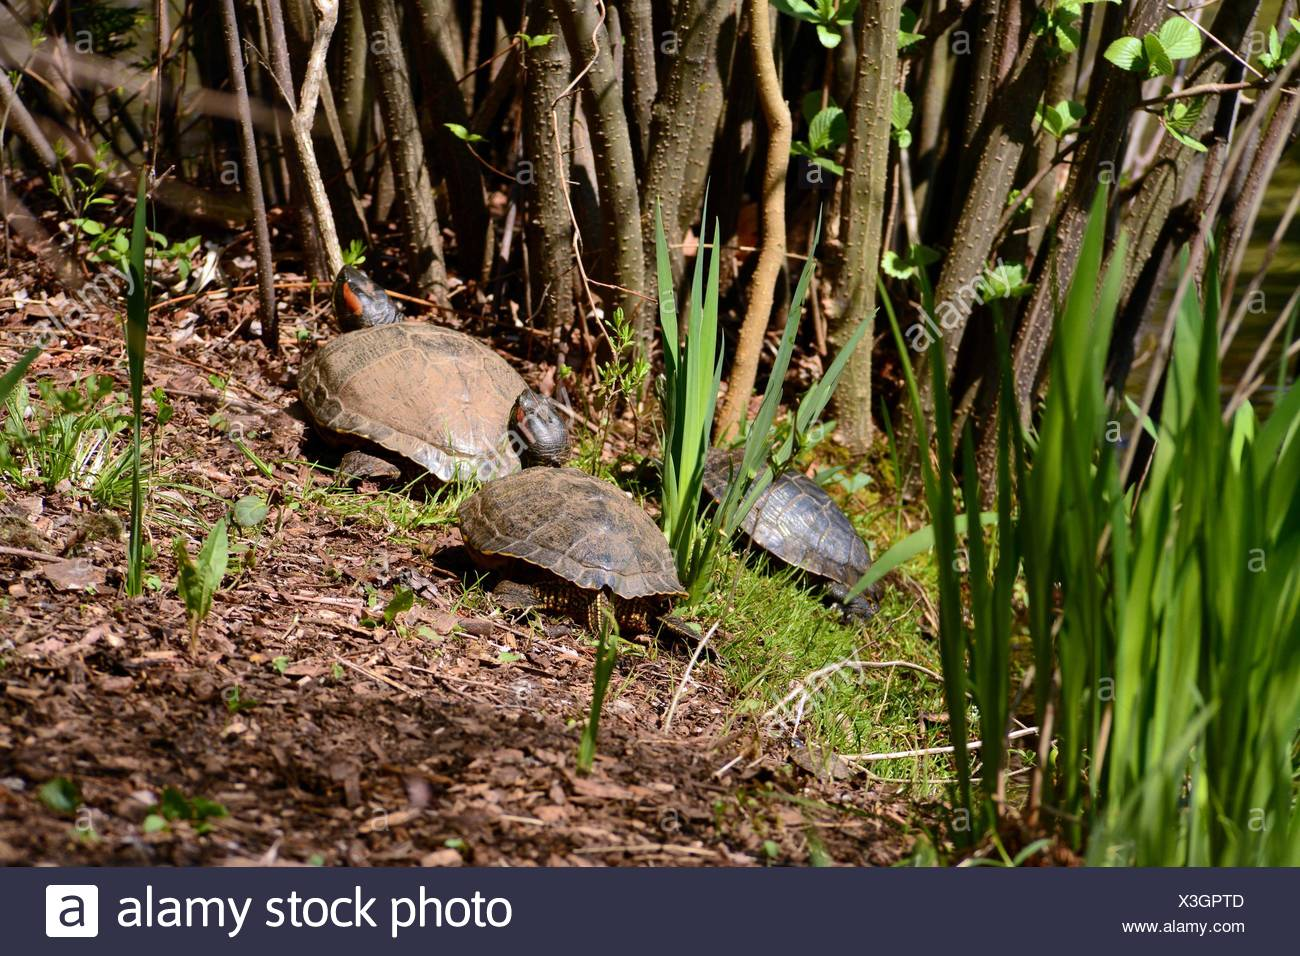 Three red-eared slider turtles, Trachemys scripta elegans, basking in the sun. - Stock Image